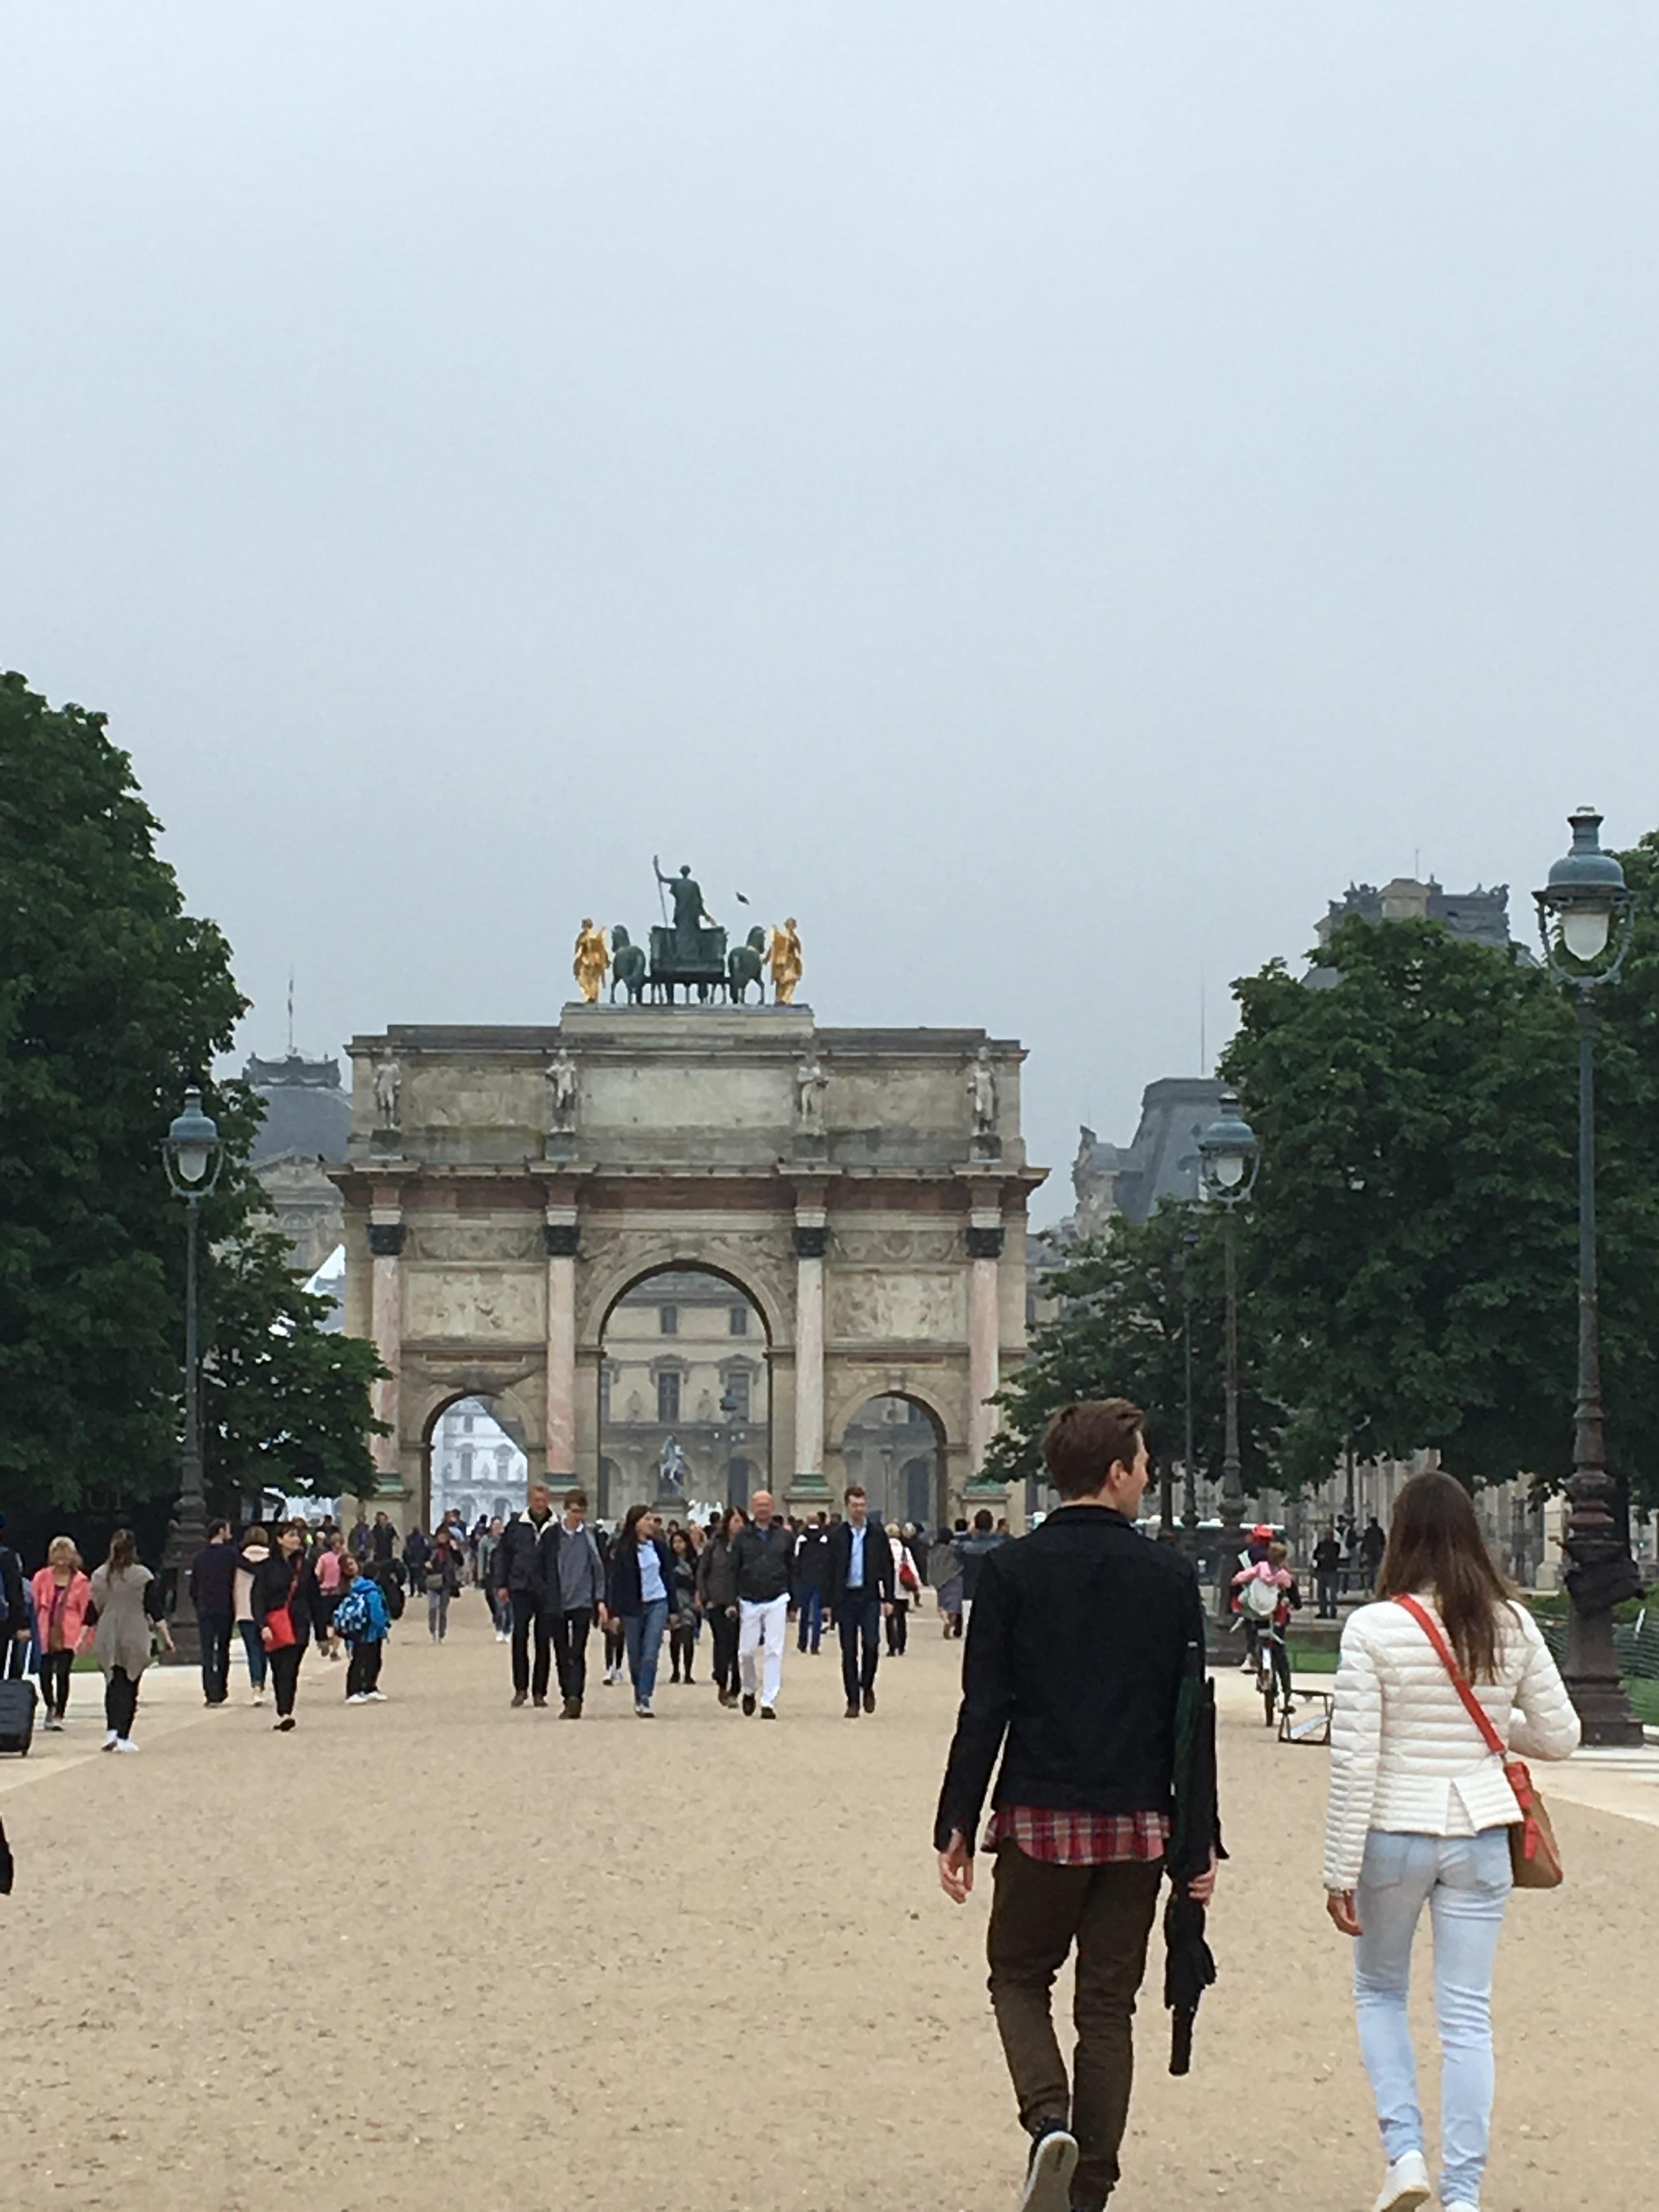 A Triumphal Arch at Palais Royal